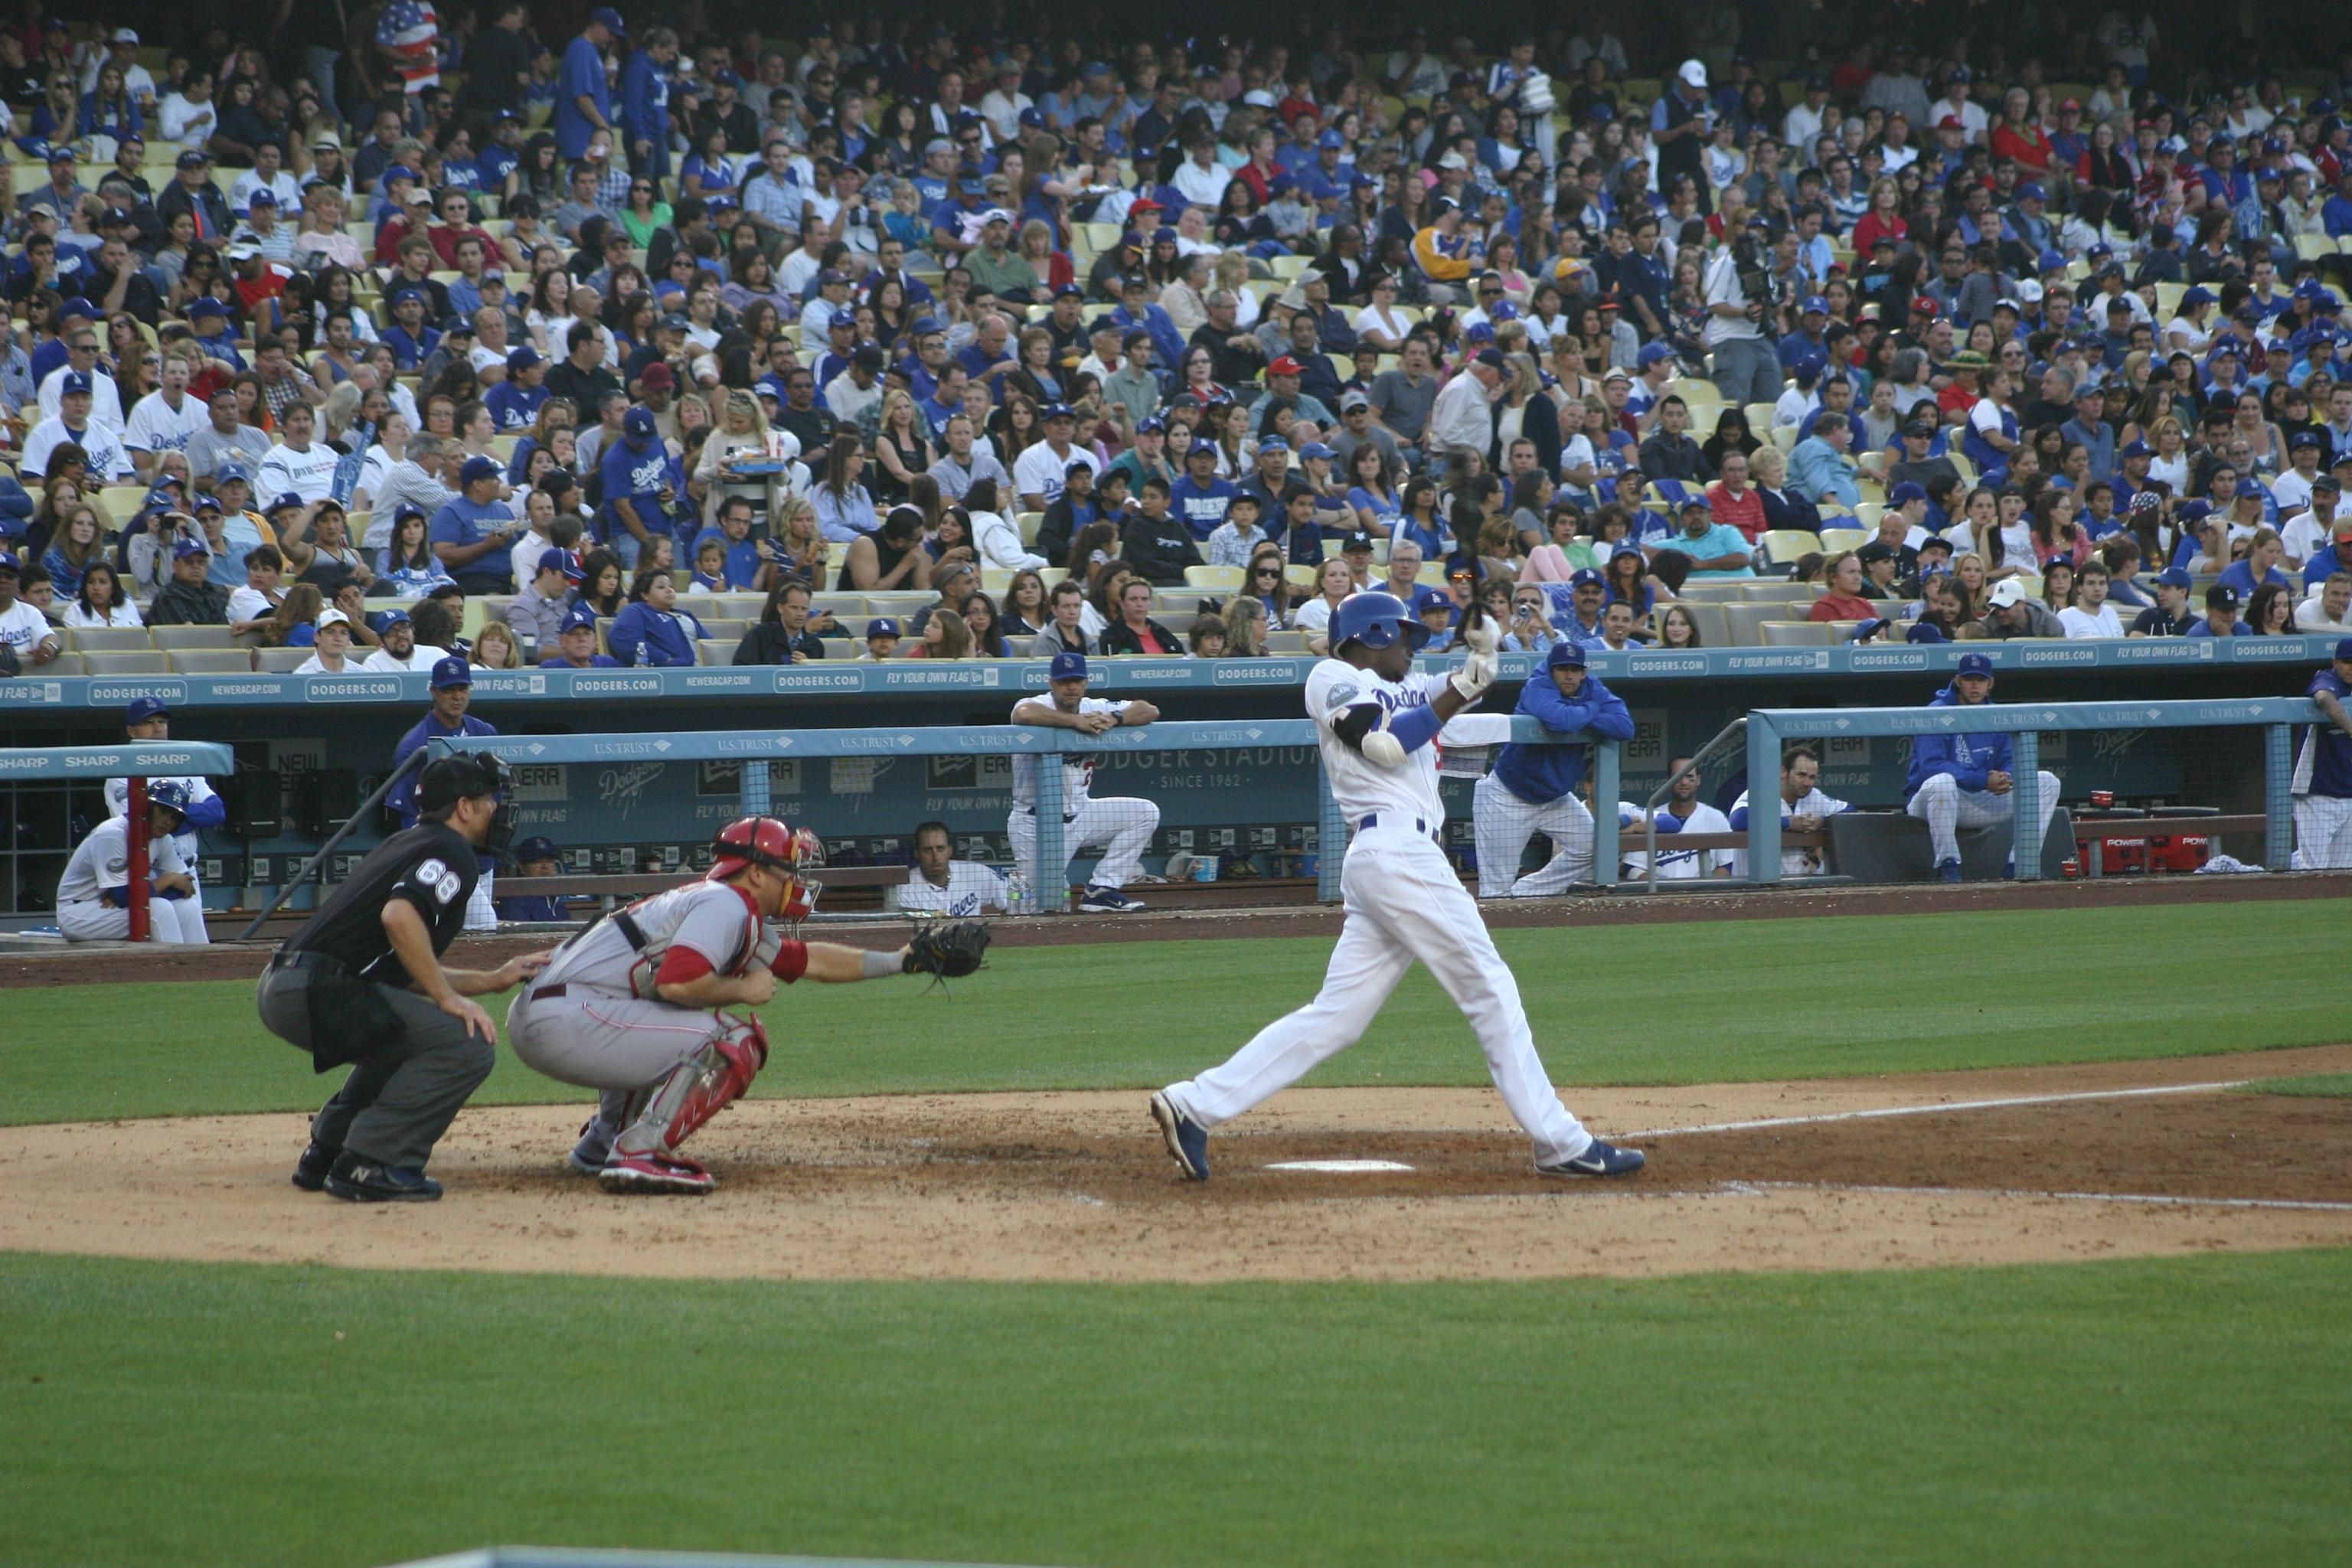 Dodger Stadium,West Coast baseball tour,baseball trips,great seats